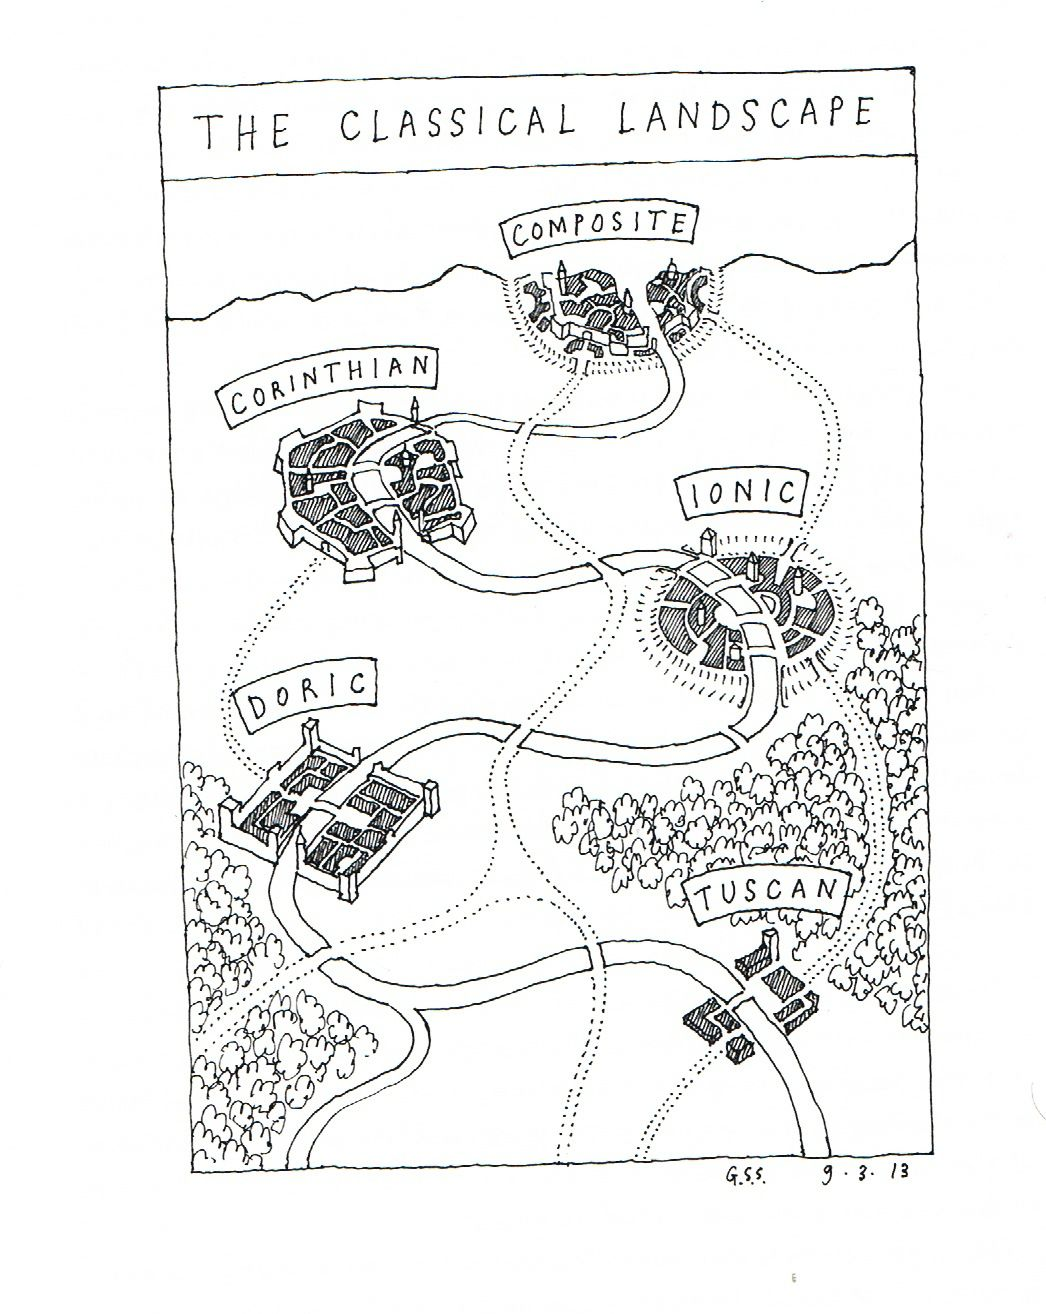 Sumarez Smith, The Classical Landscape